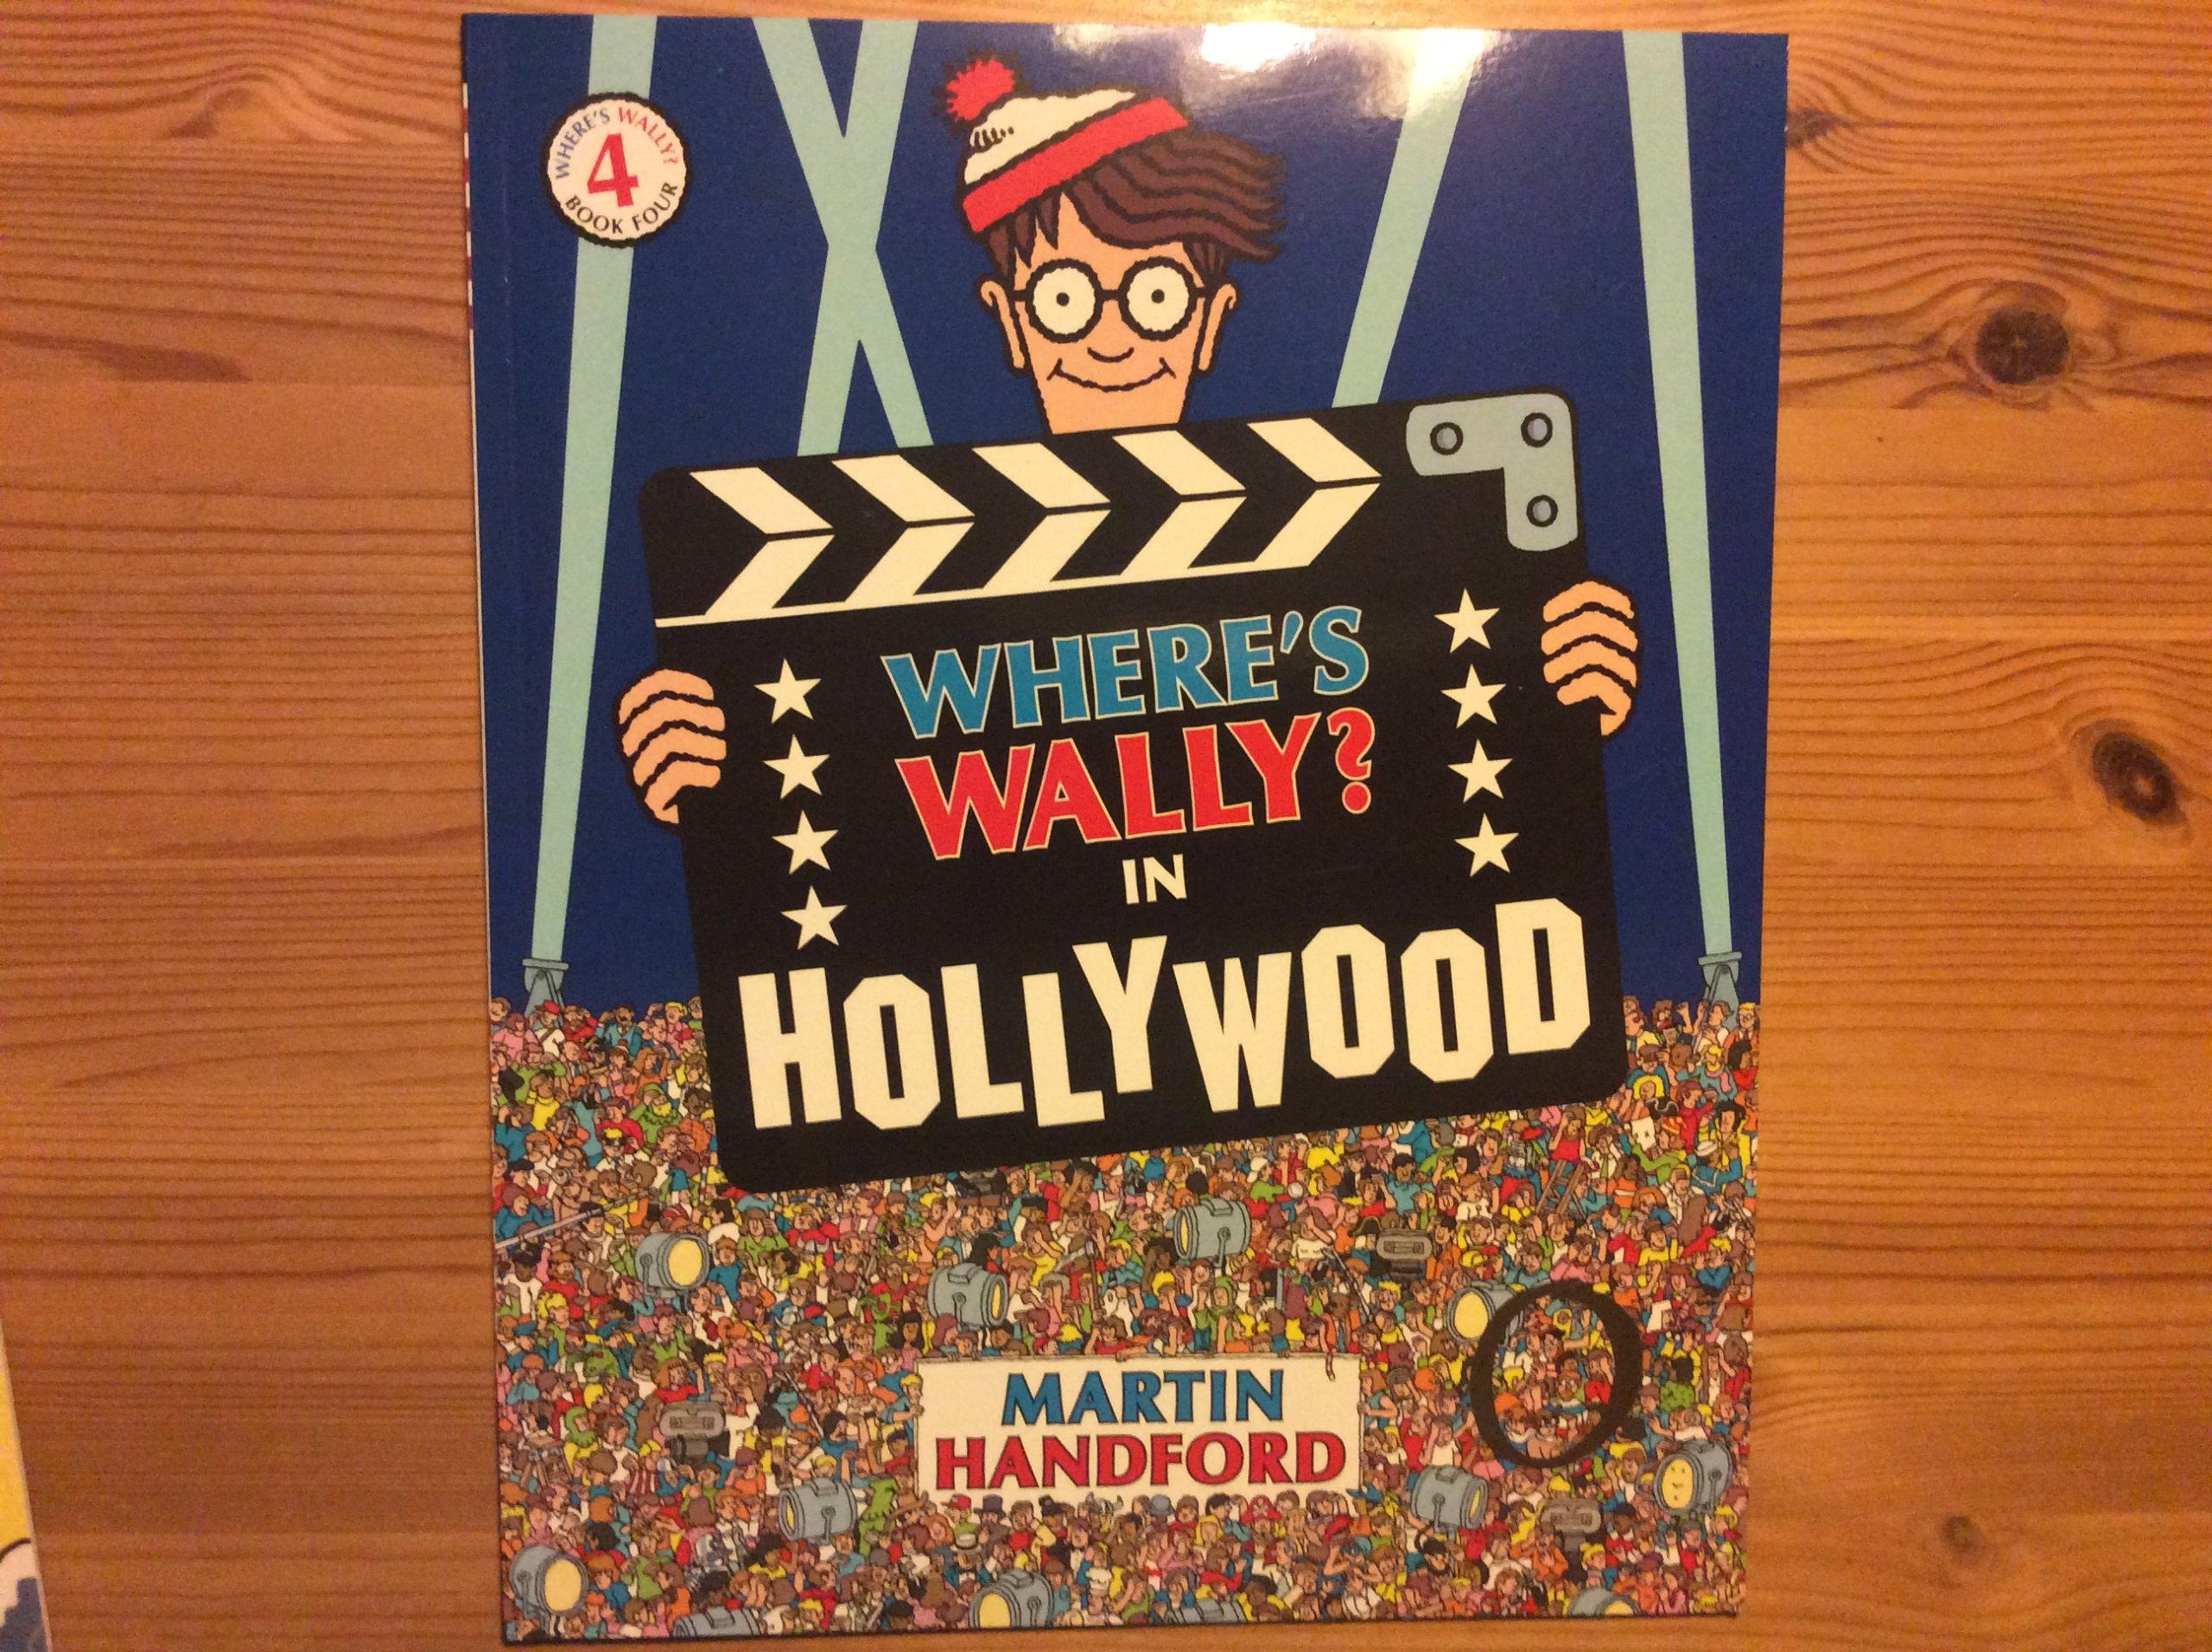 Wheres Wally in Hollywood